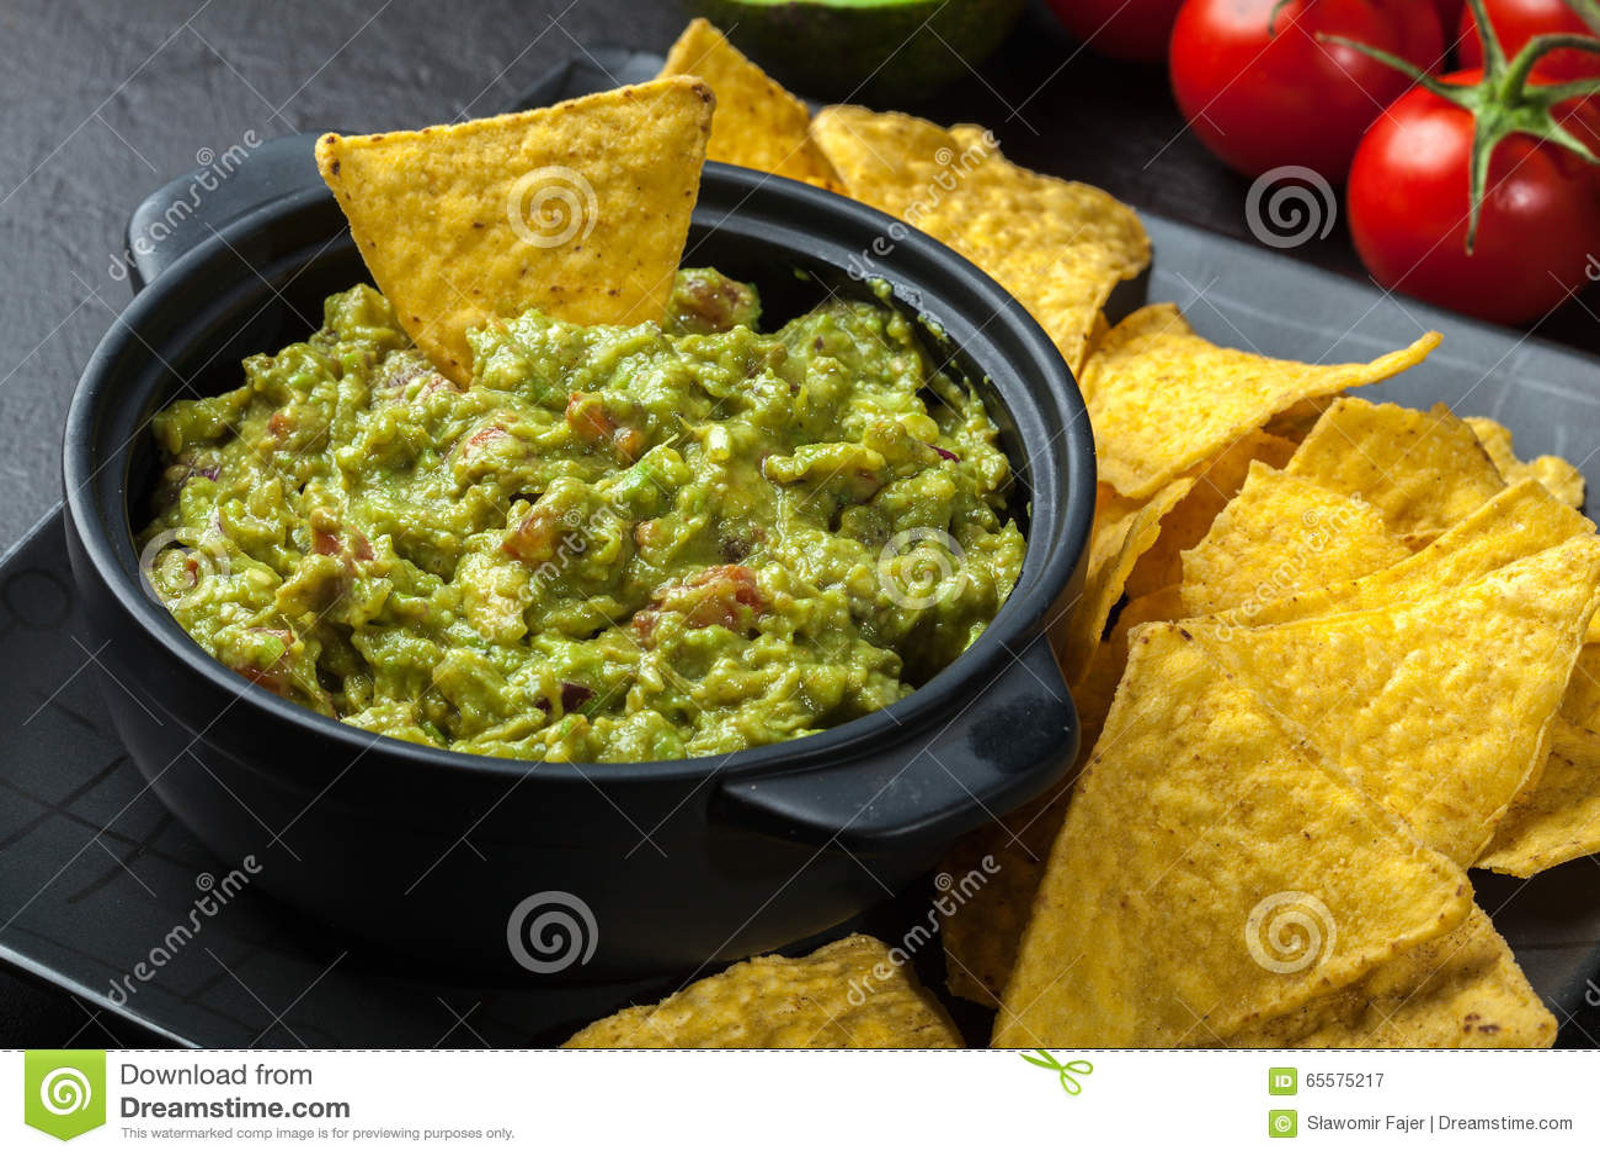 Bacia de guacamole com microplaquetas de milho